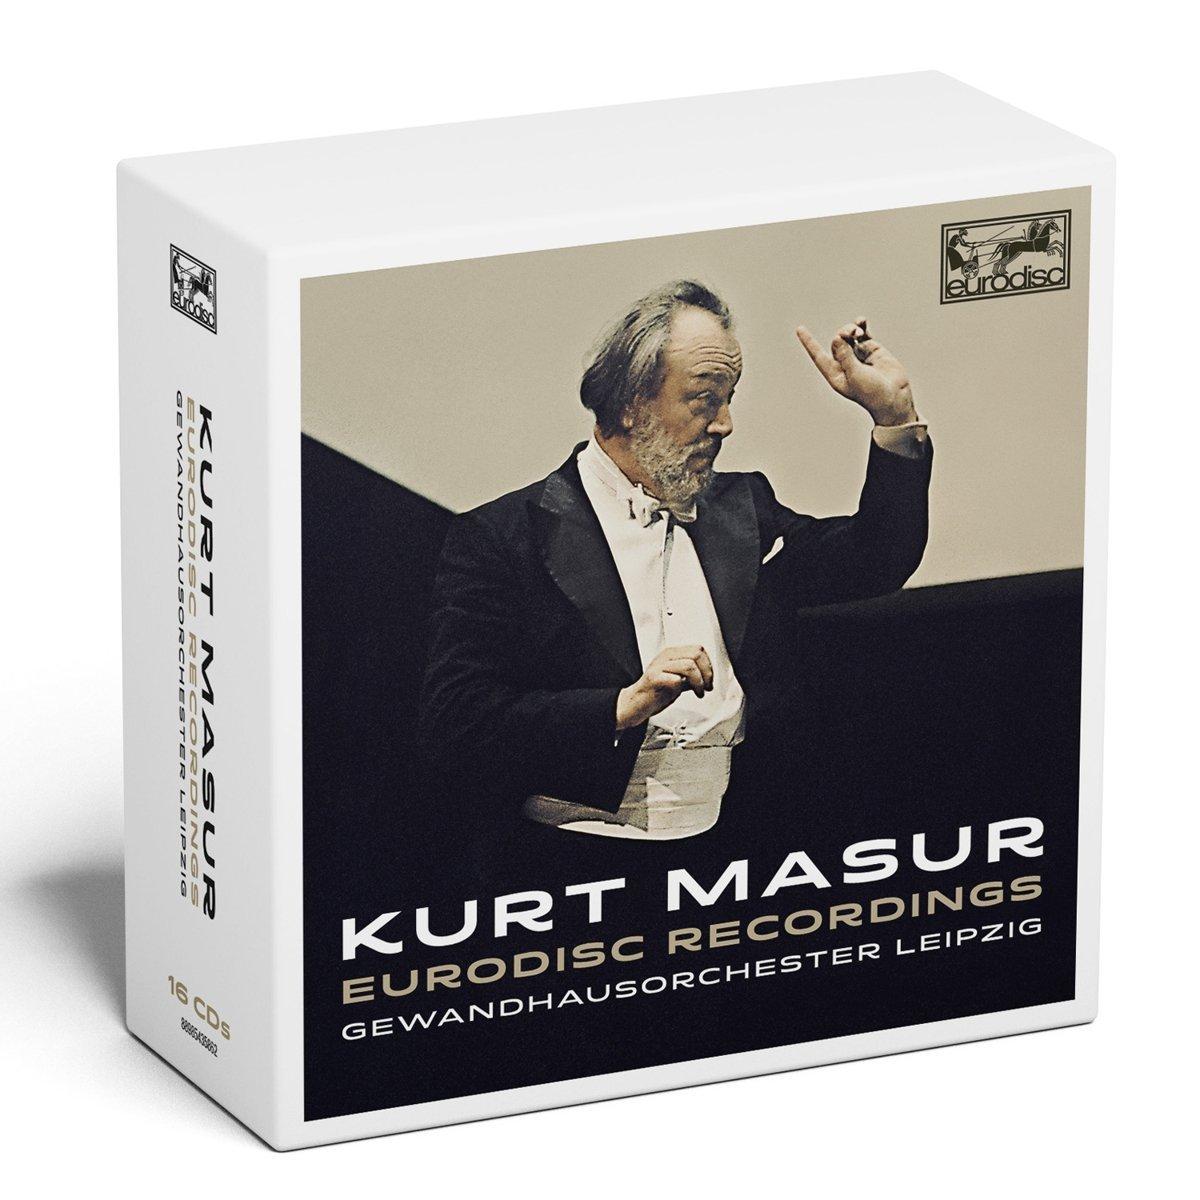 Eurodisc Recordings - Box set